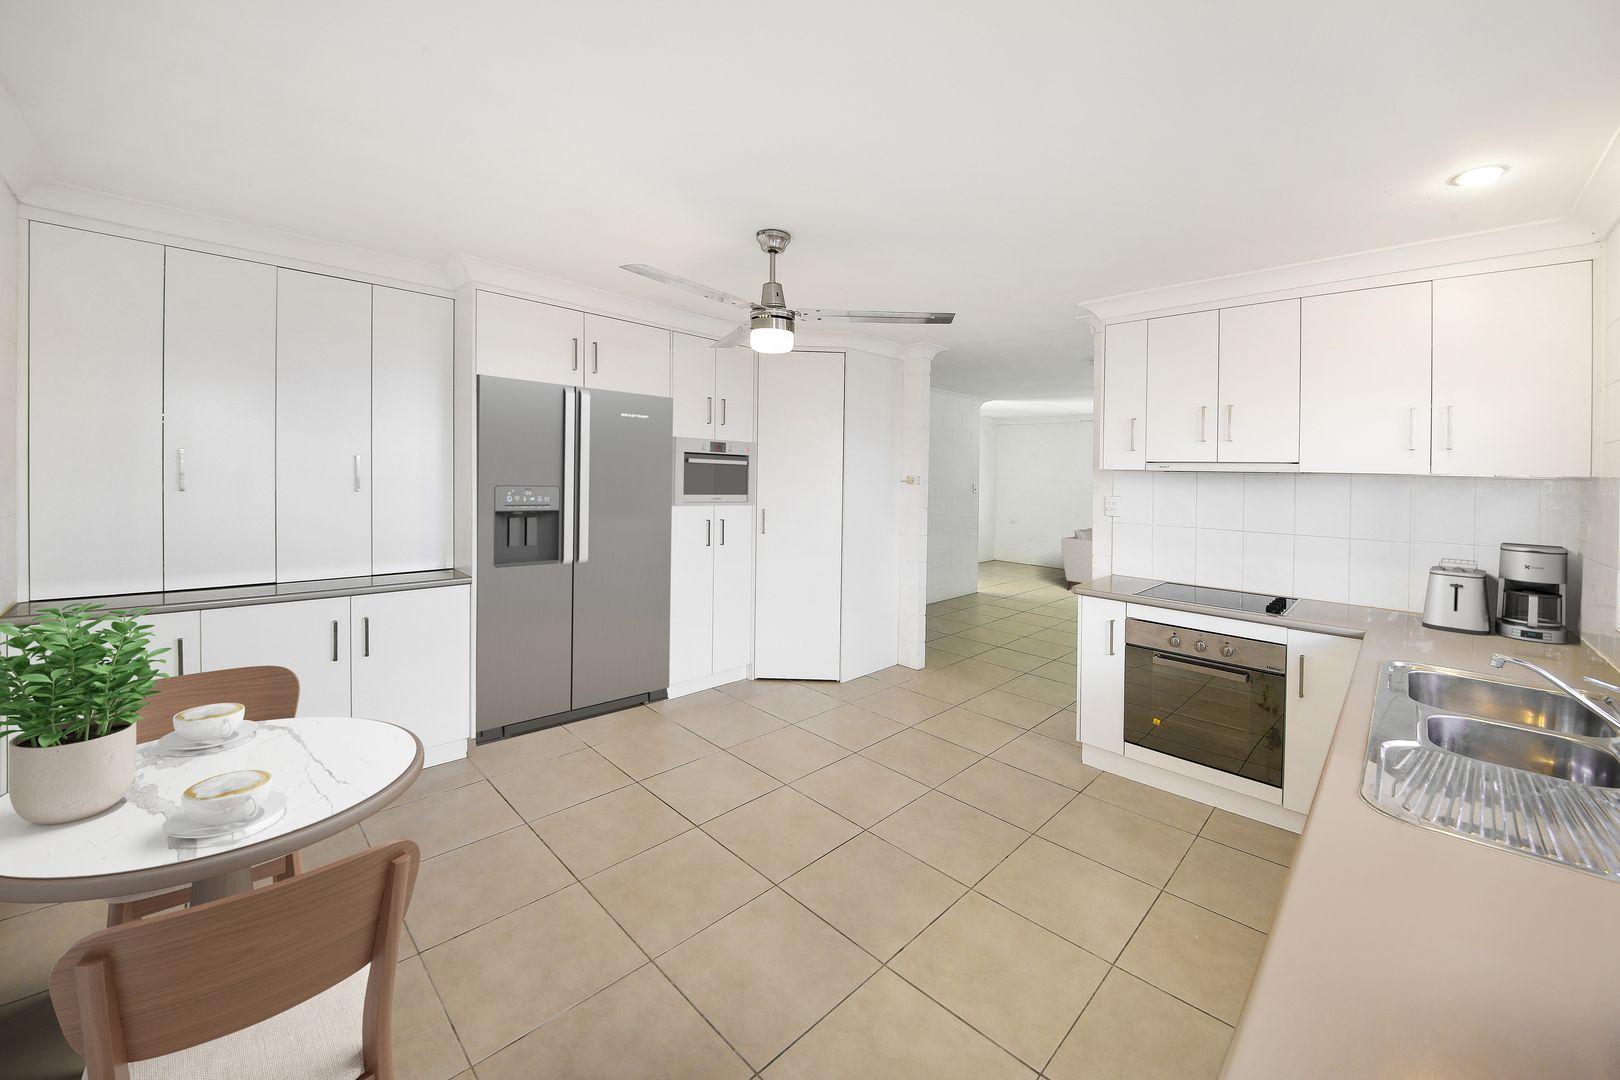 R237 Elonera Street, Currimundi QLD 4551, Image 2